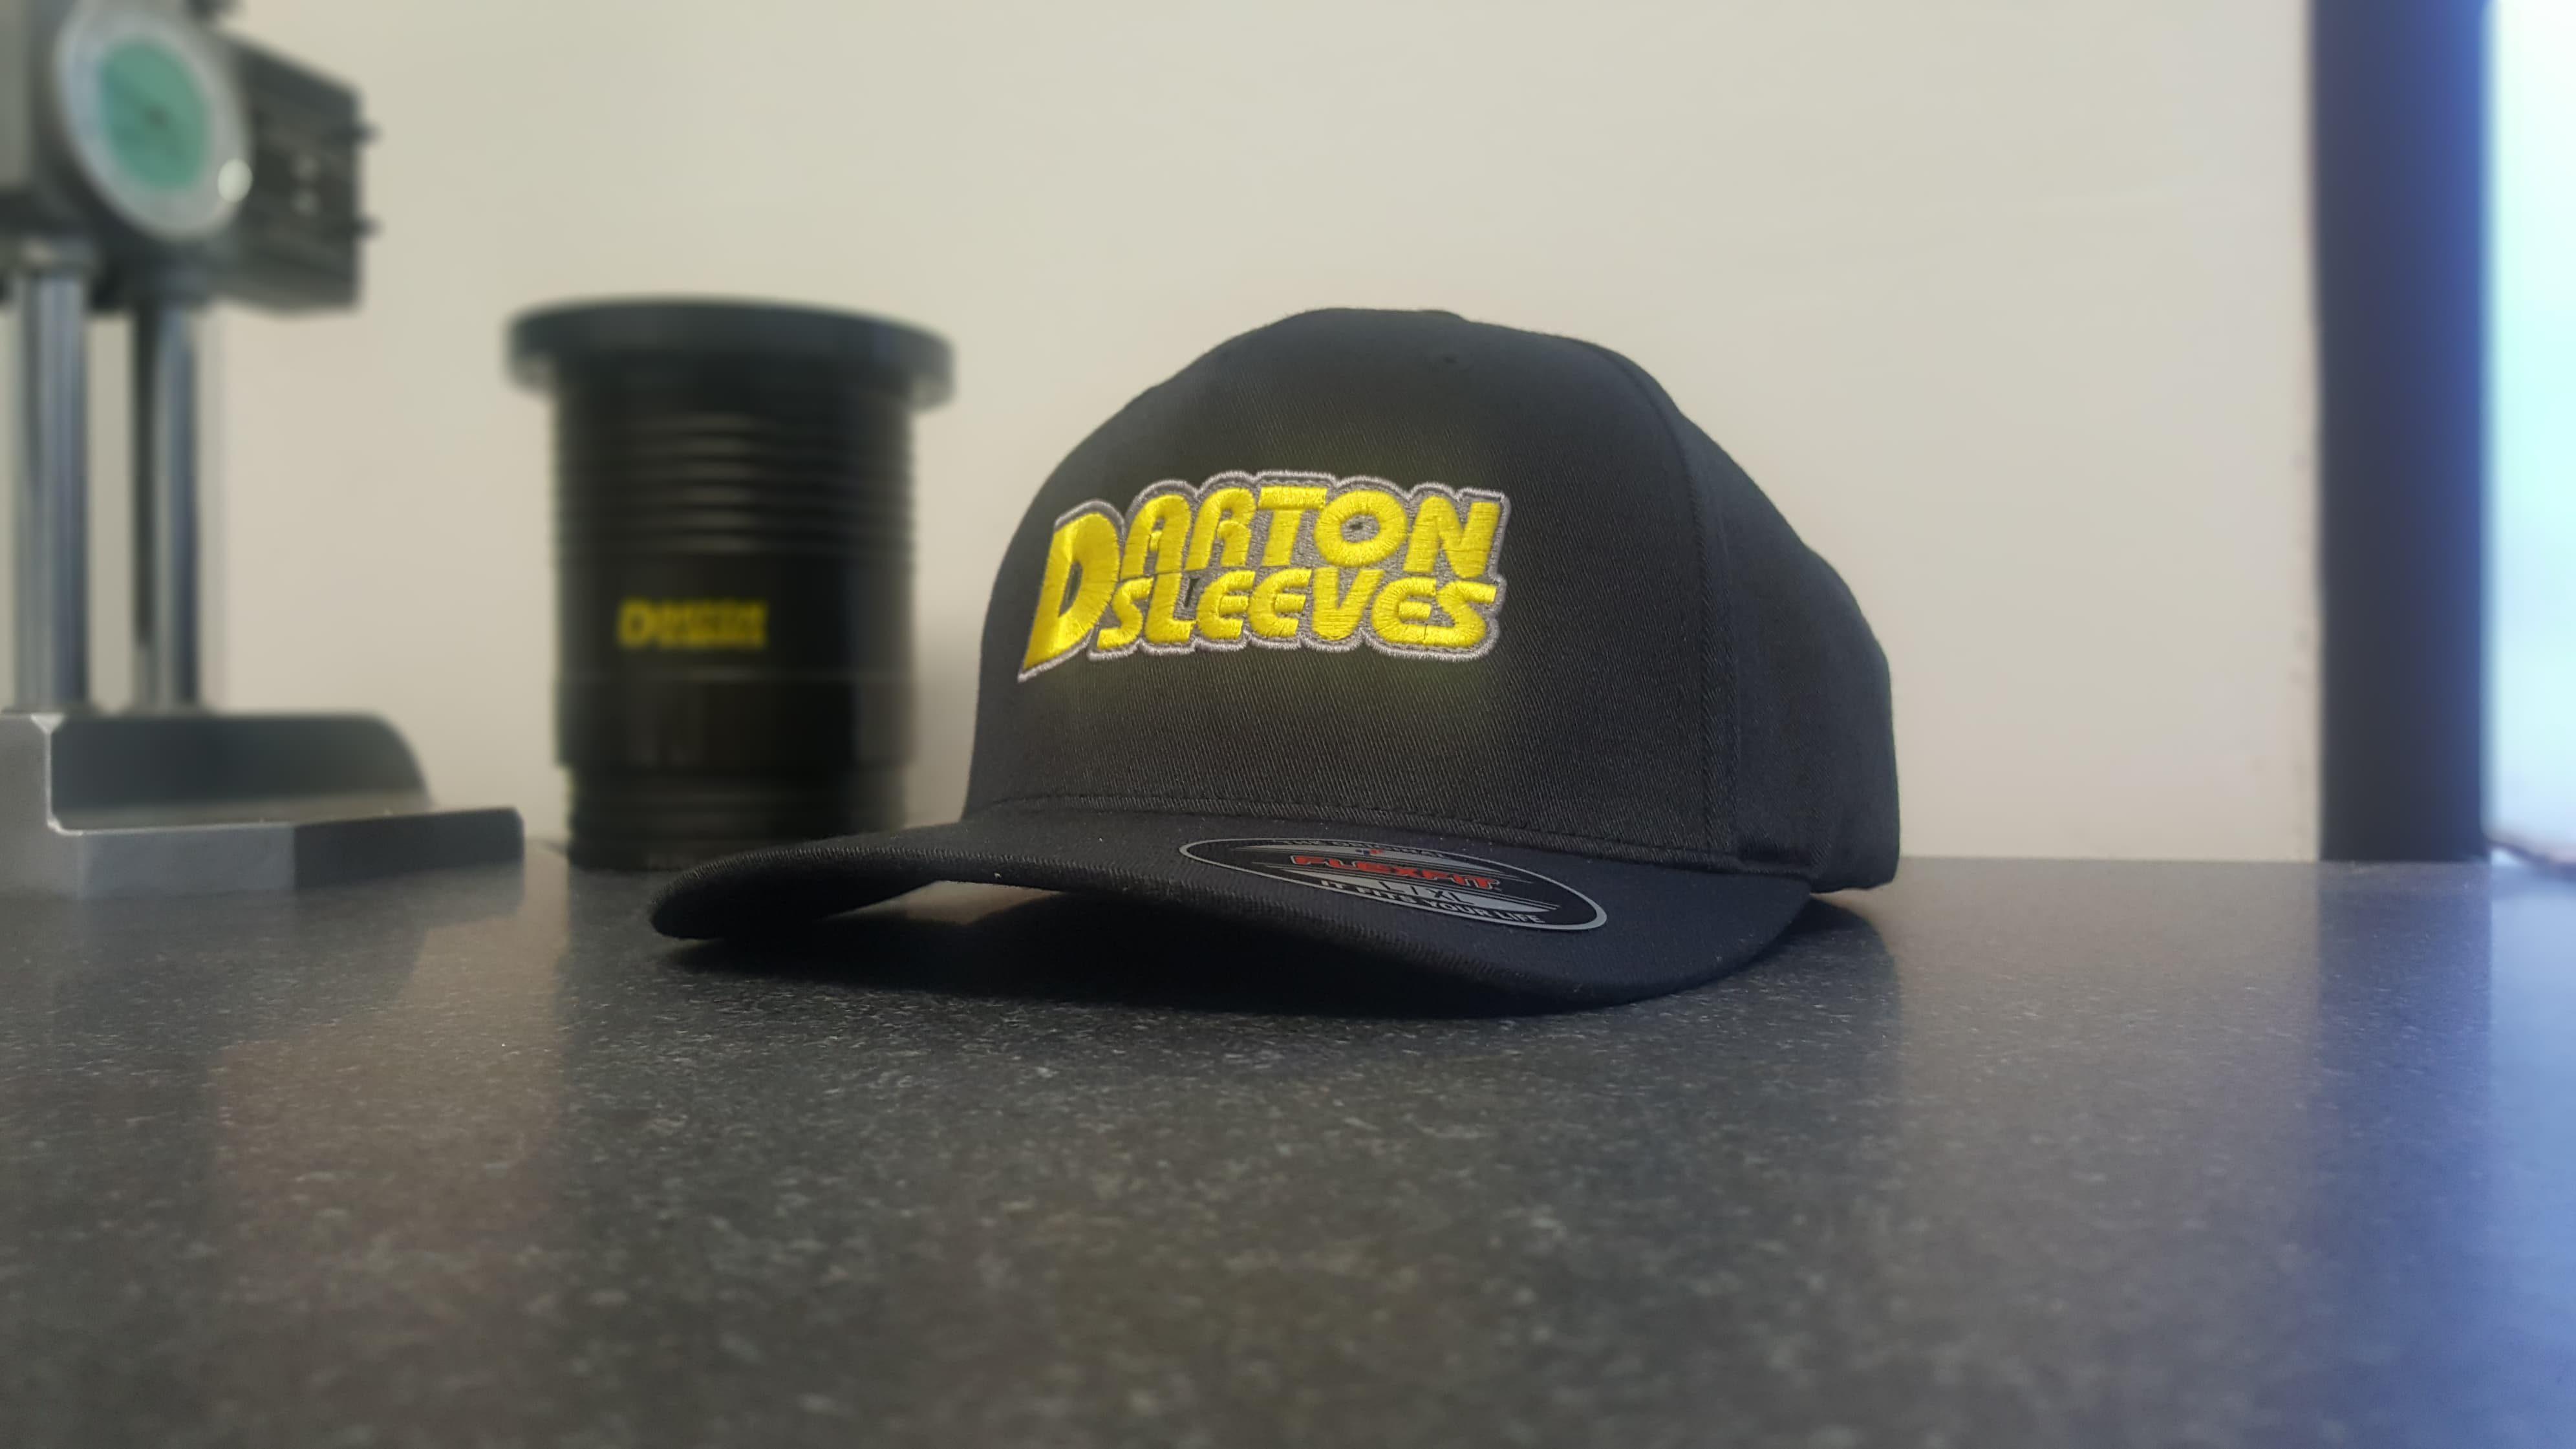 Darton Sleeves Cap